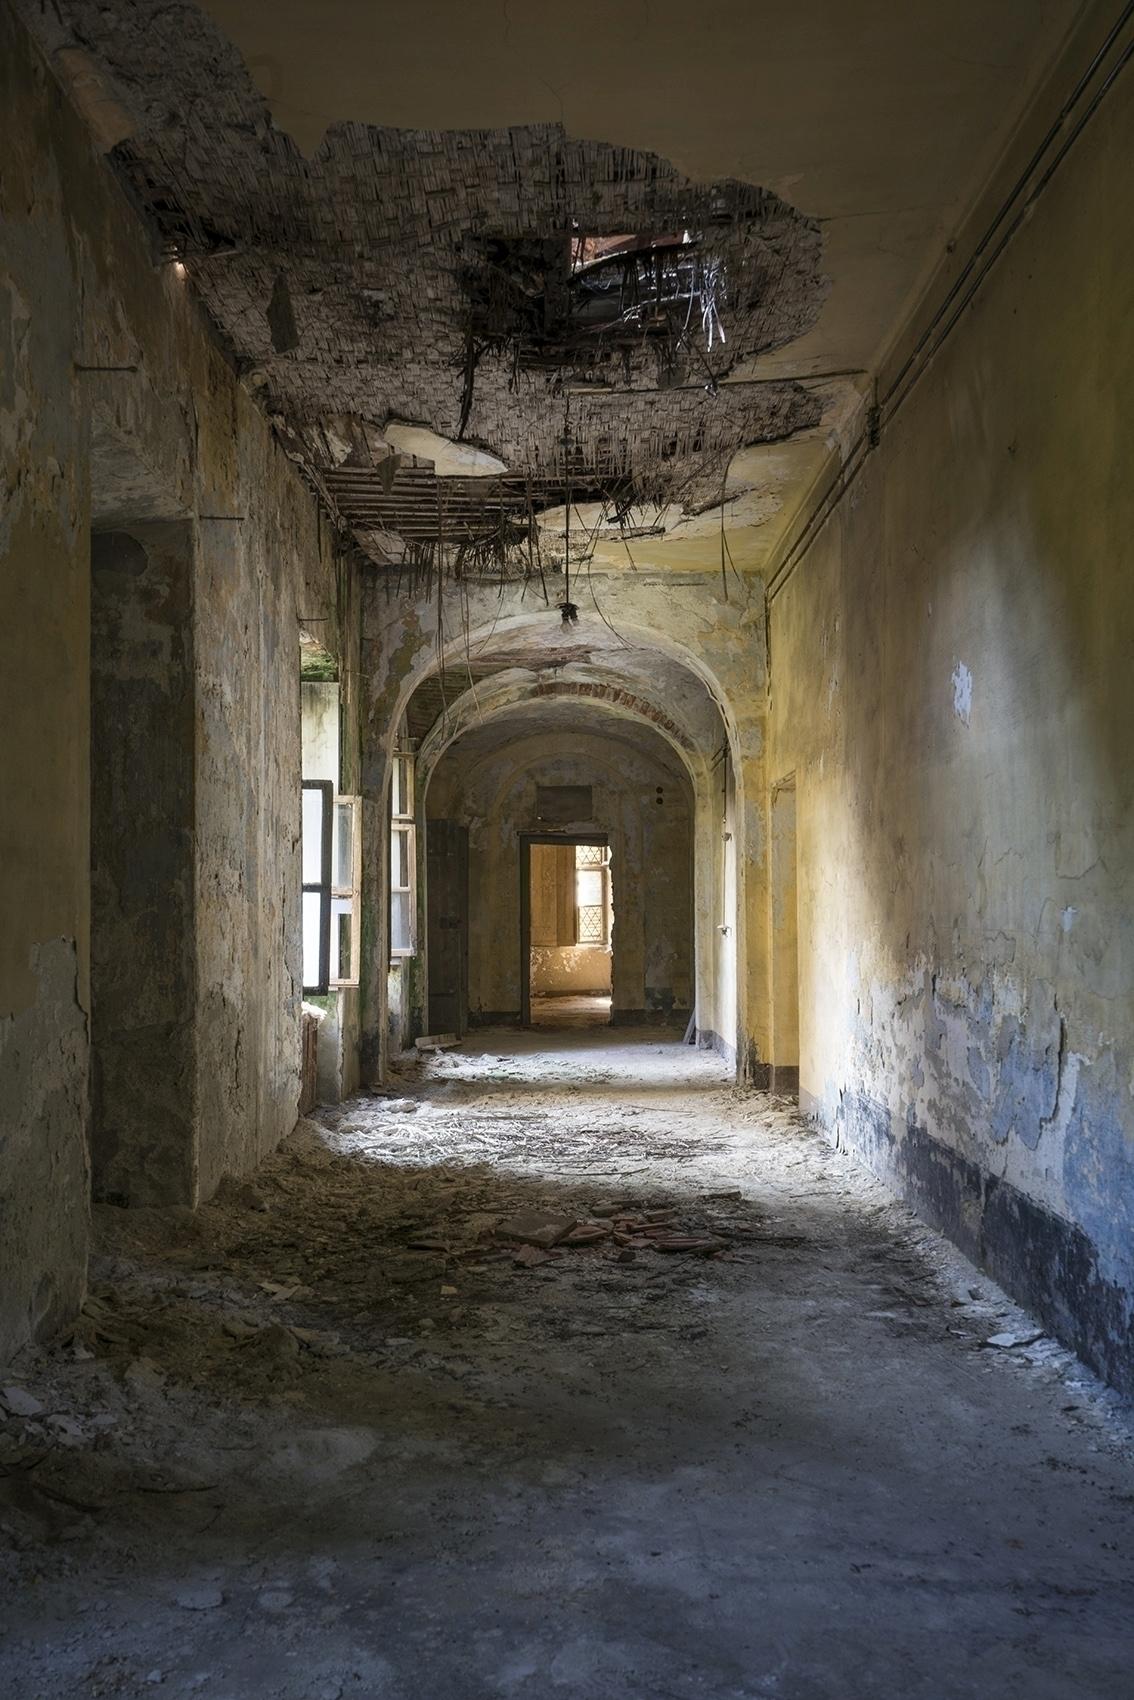 corridors long abandoned psychi - forgottenheritage | ello